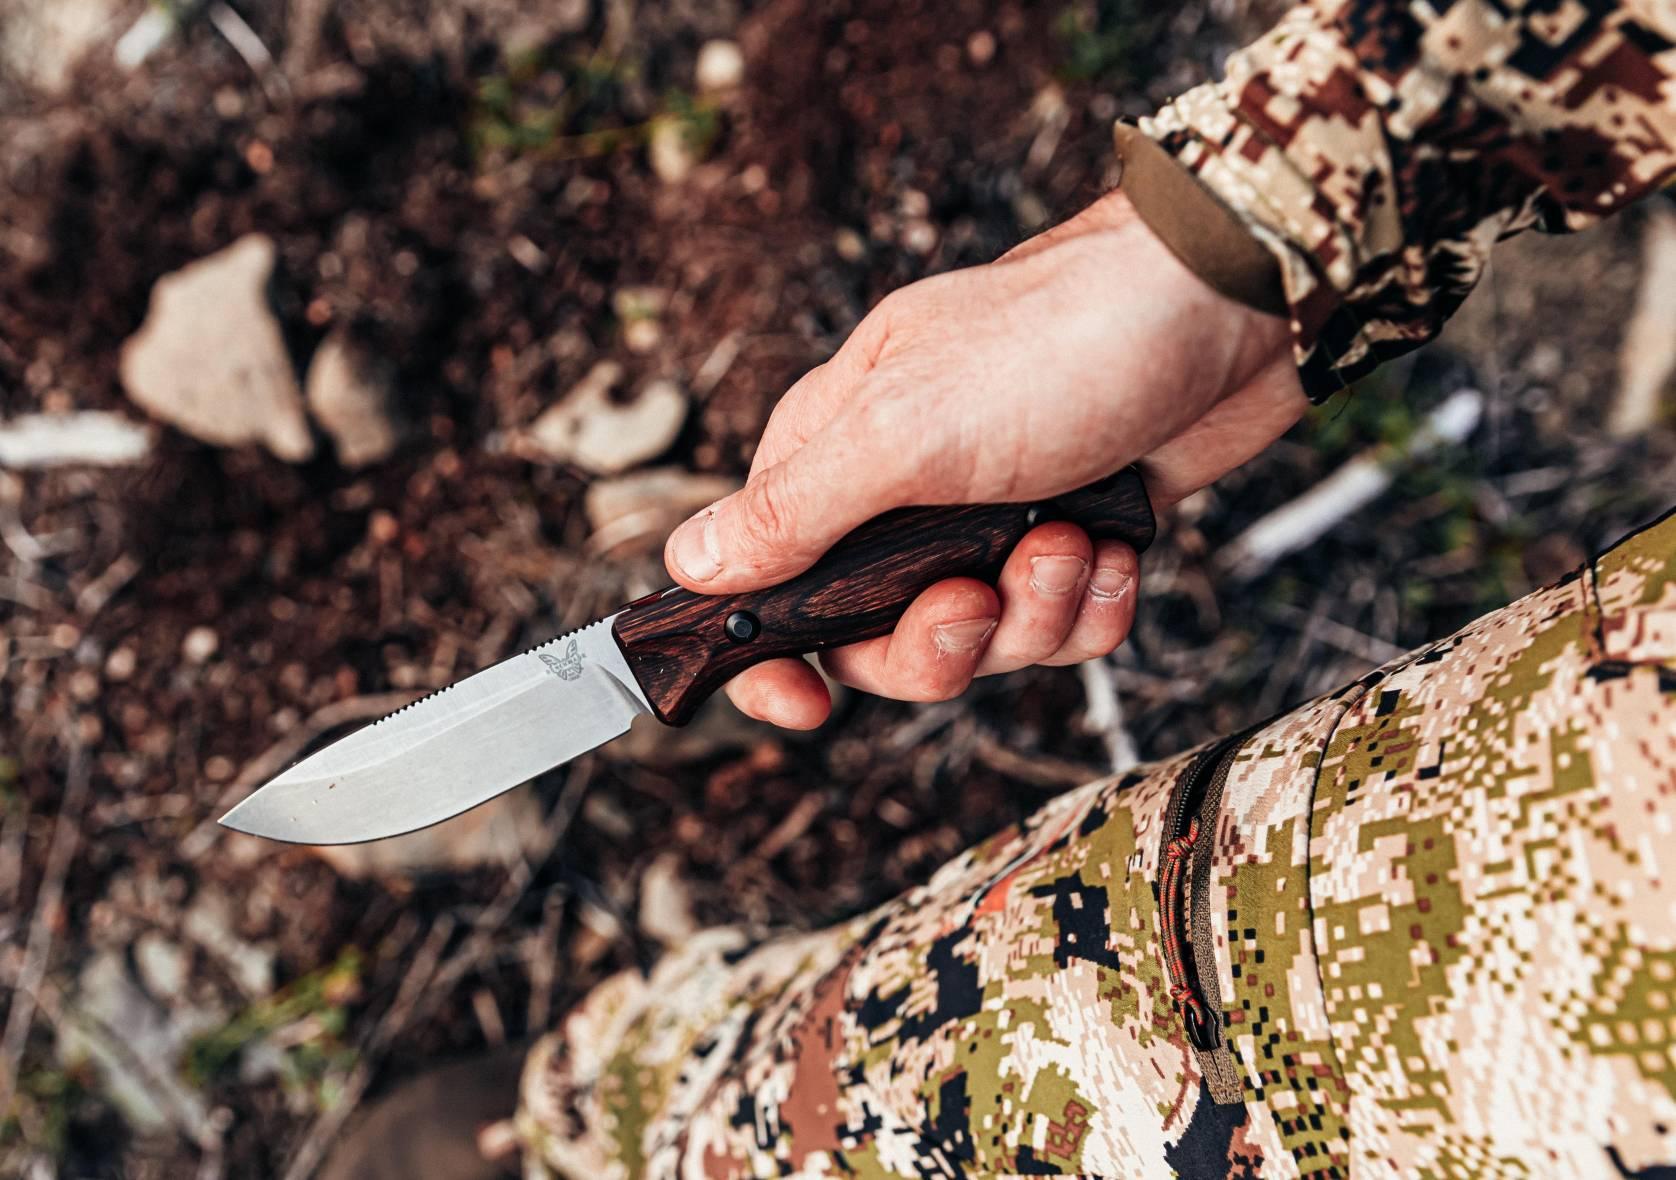 Benchmade Hunting Knife